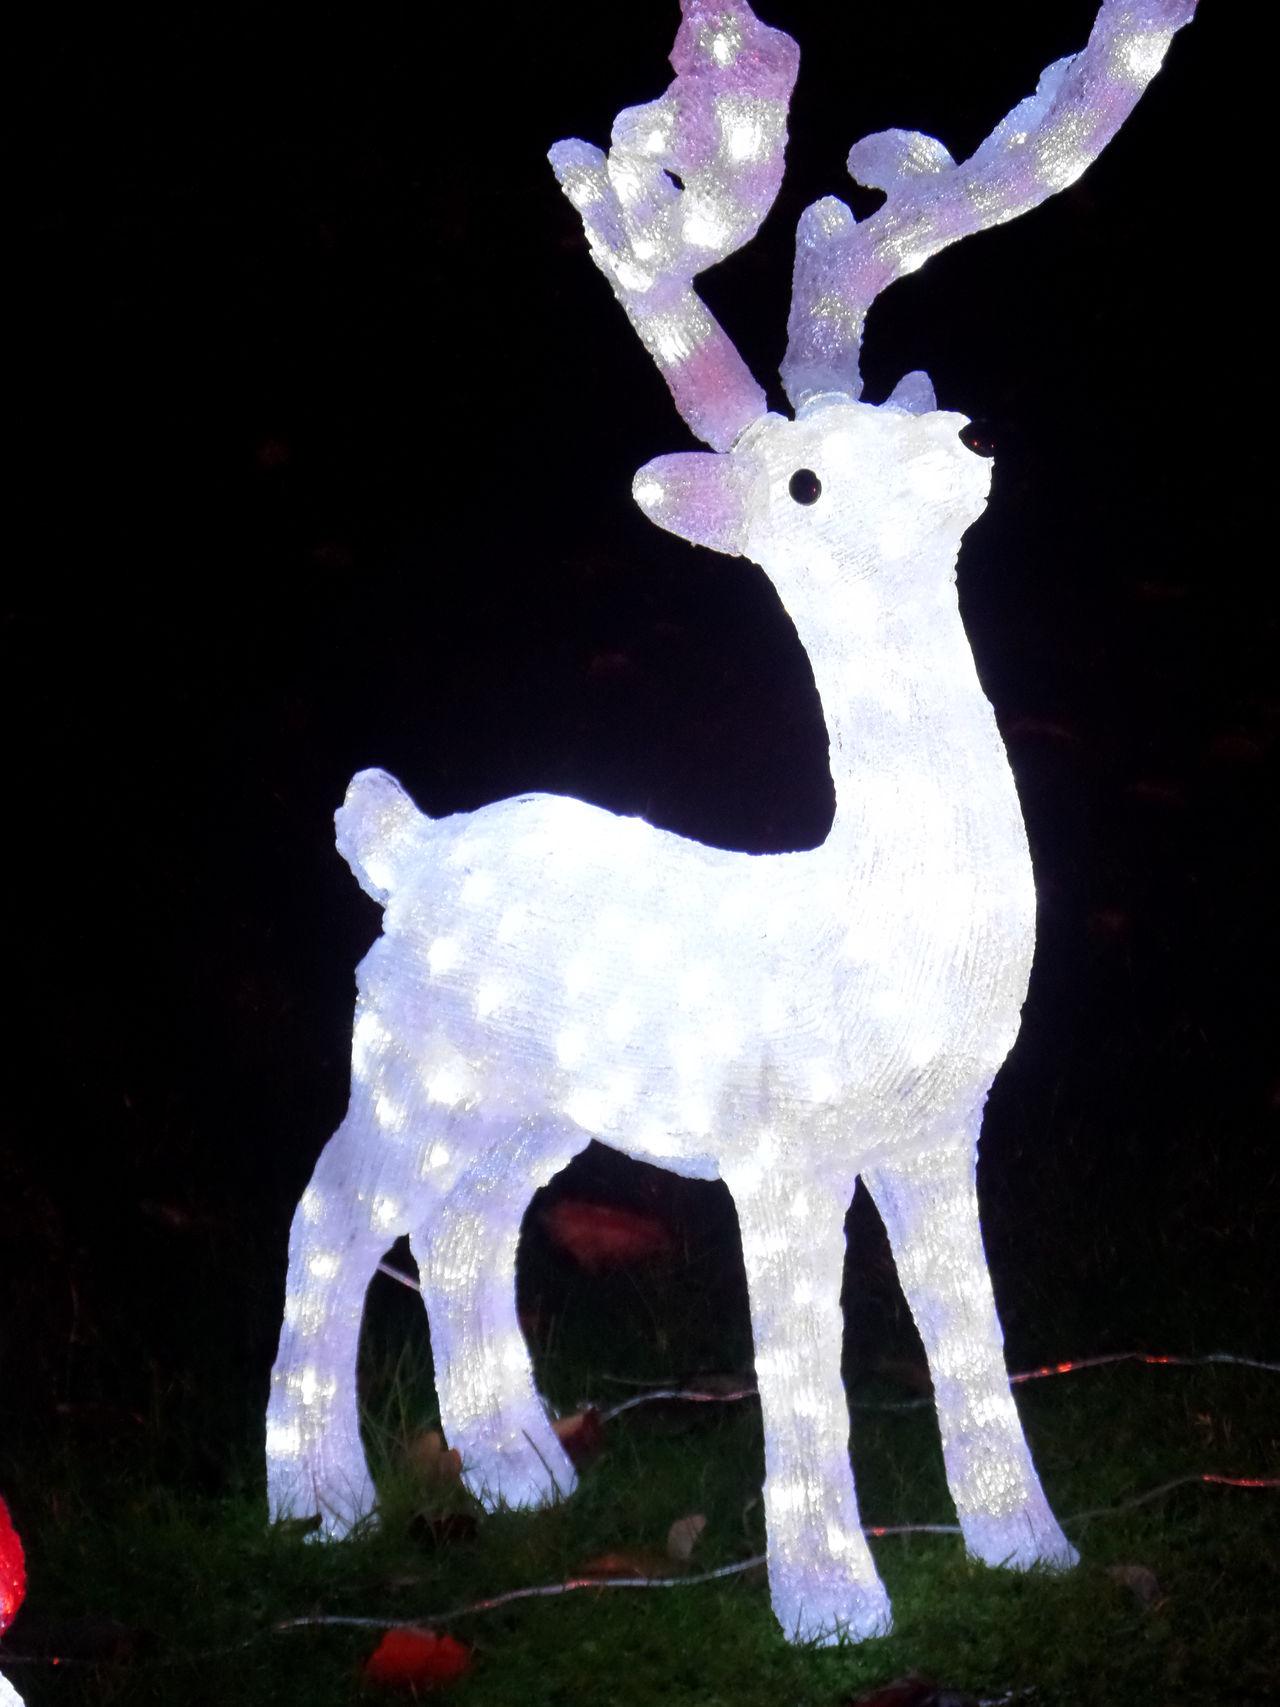 Celebration. Christmas Lights. Not Long Now Chrisytmas Decoration Copy Space. Holidays Lit Up Rheindeer. No People. Beauty In Nature Diamond Pattern One Rheindeer, Rheindeer. Thankgiving.